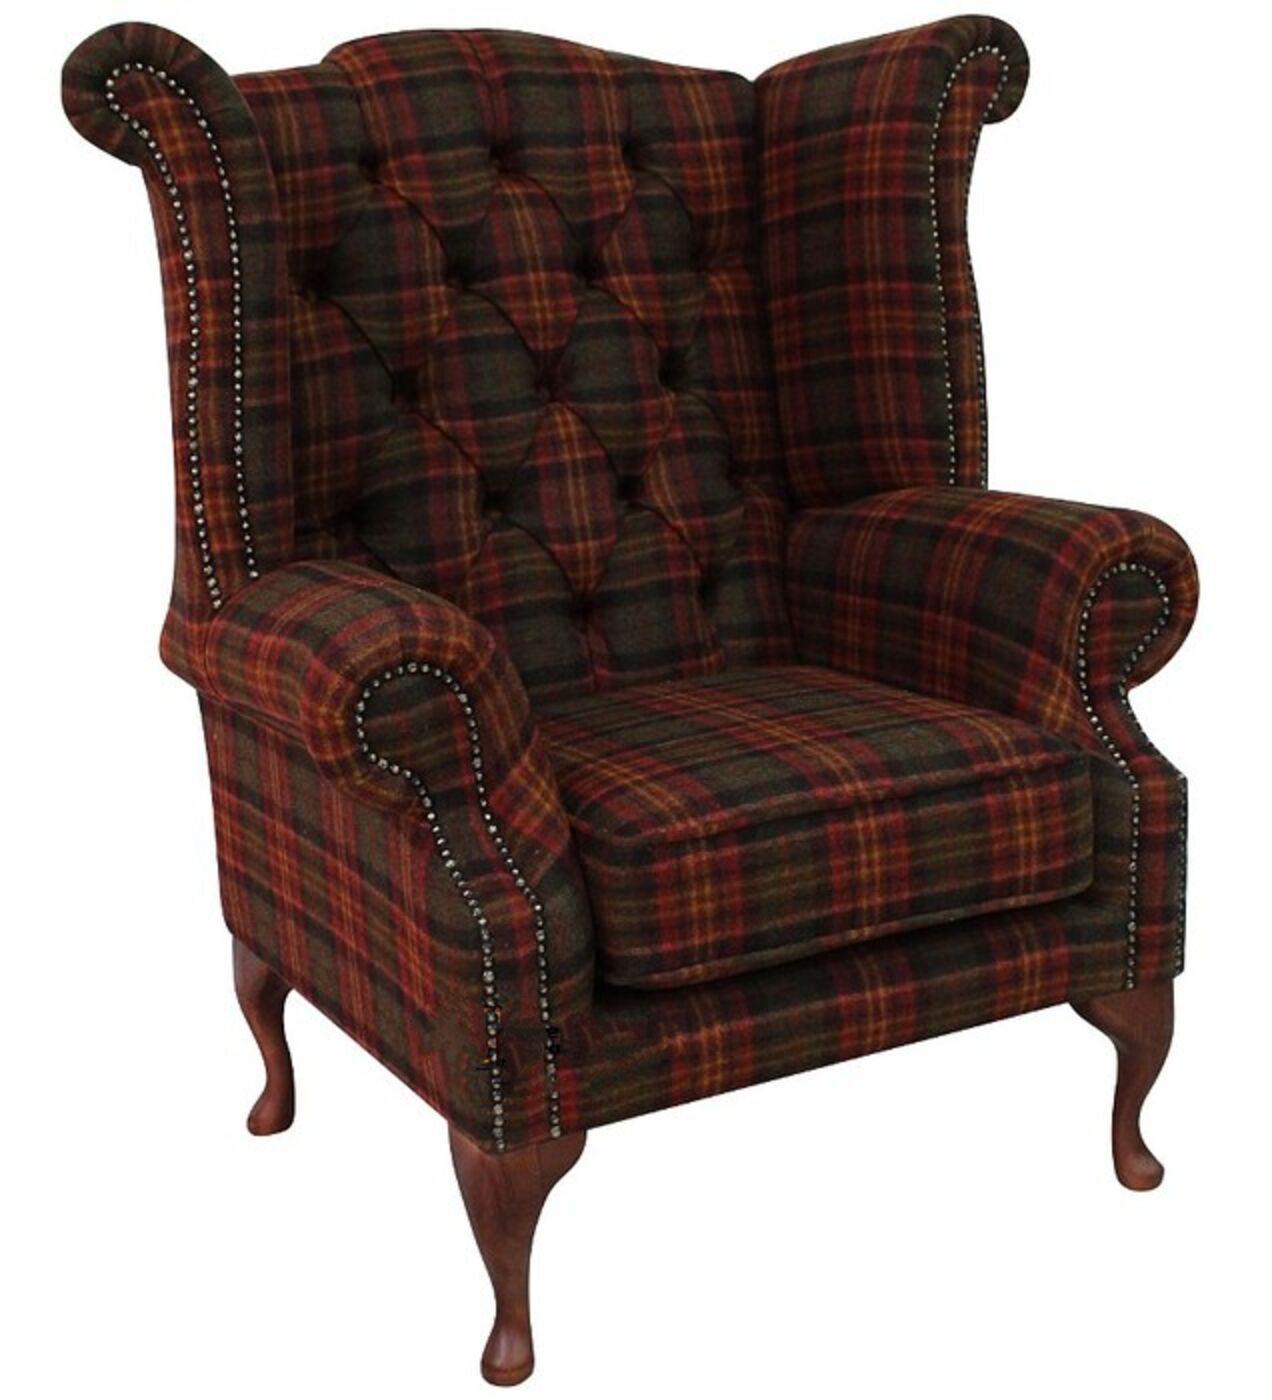 Chesterfield Queen Anne Wool Tweed Wing Chair Fireside High Back Armchair  Sandringham Mandarin Check